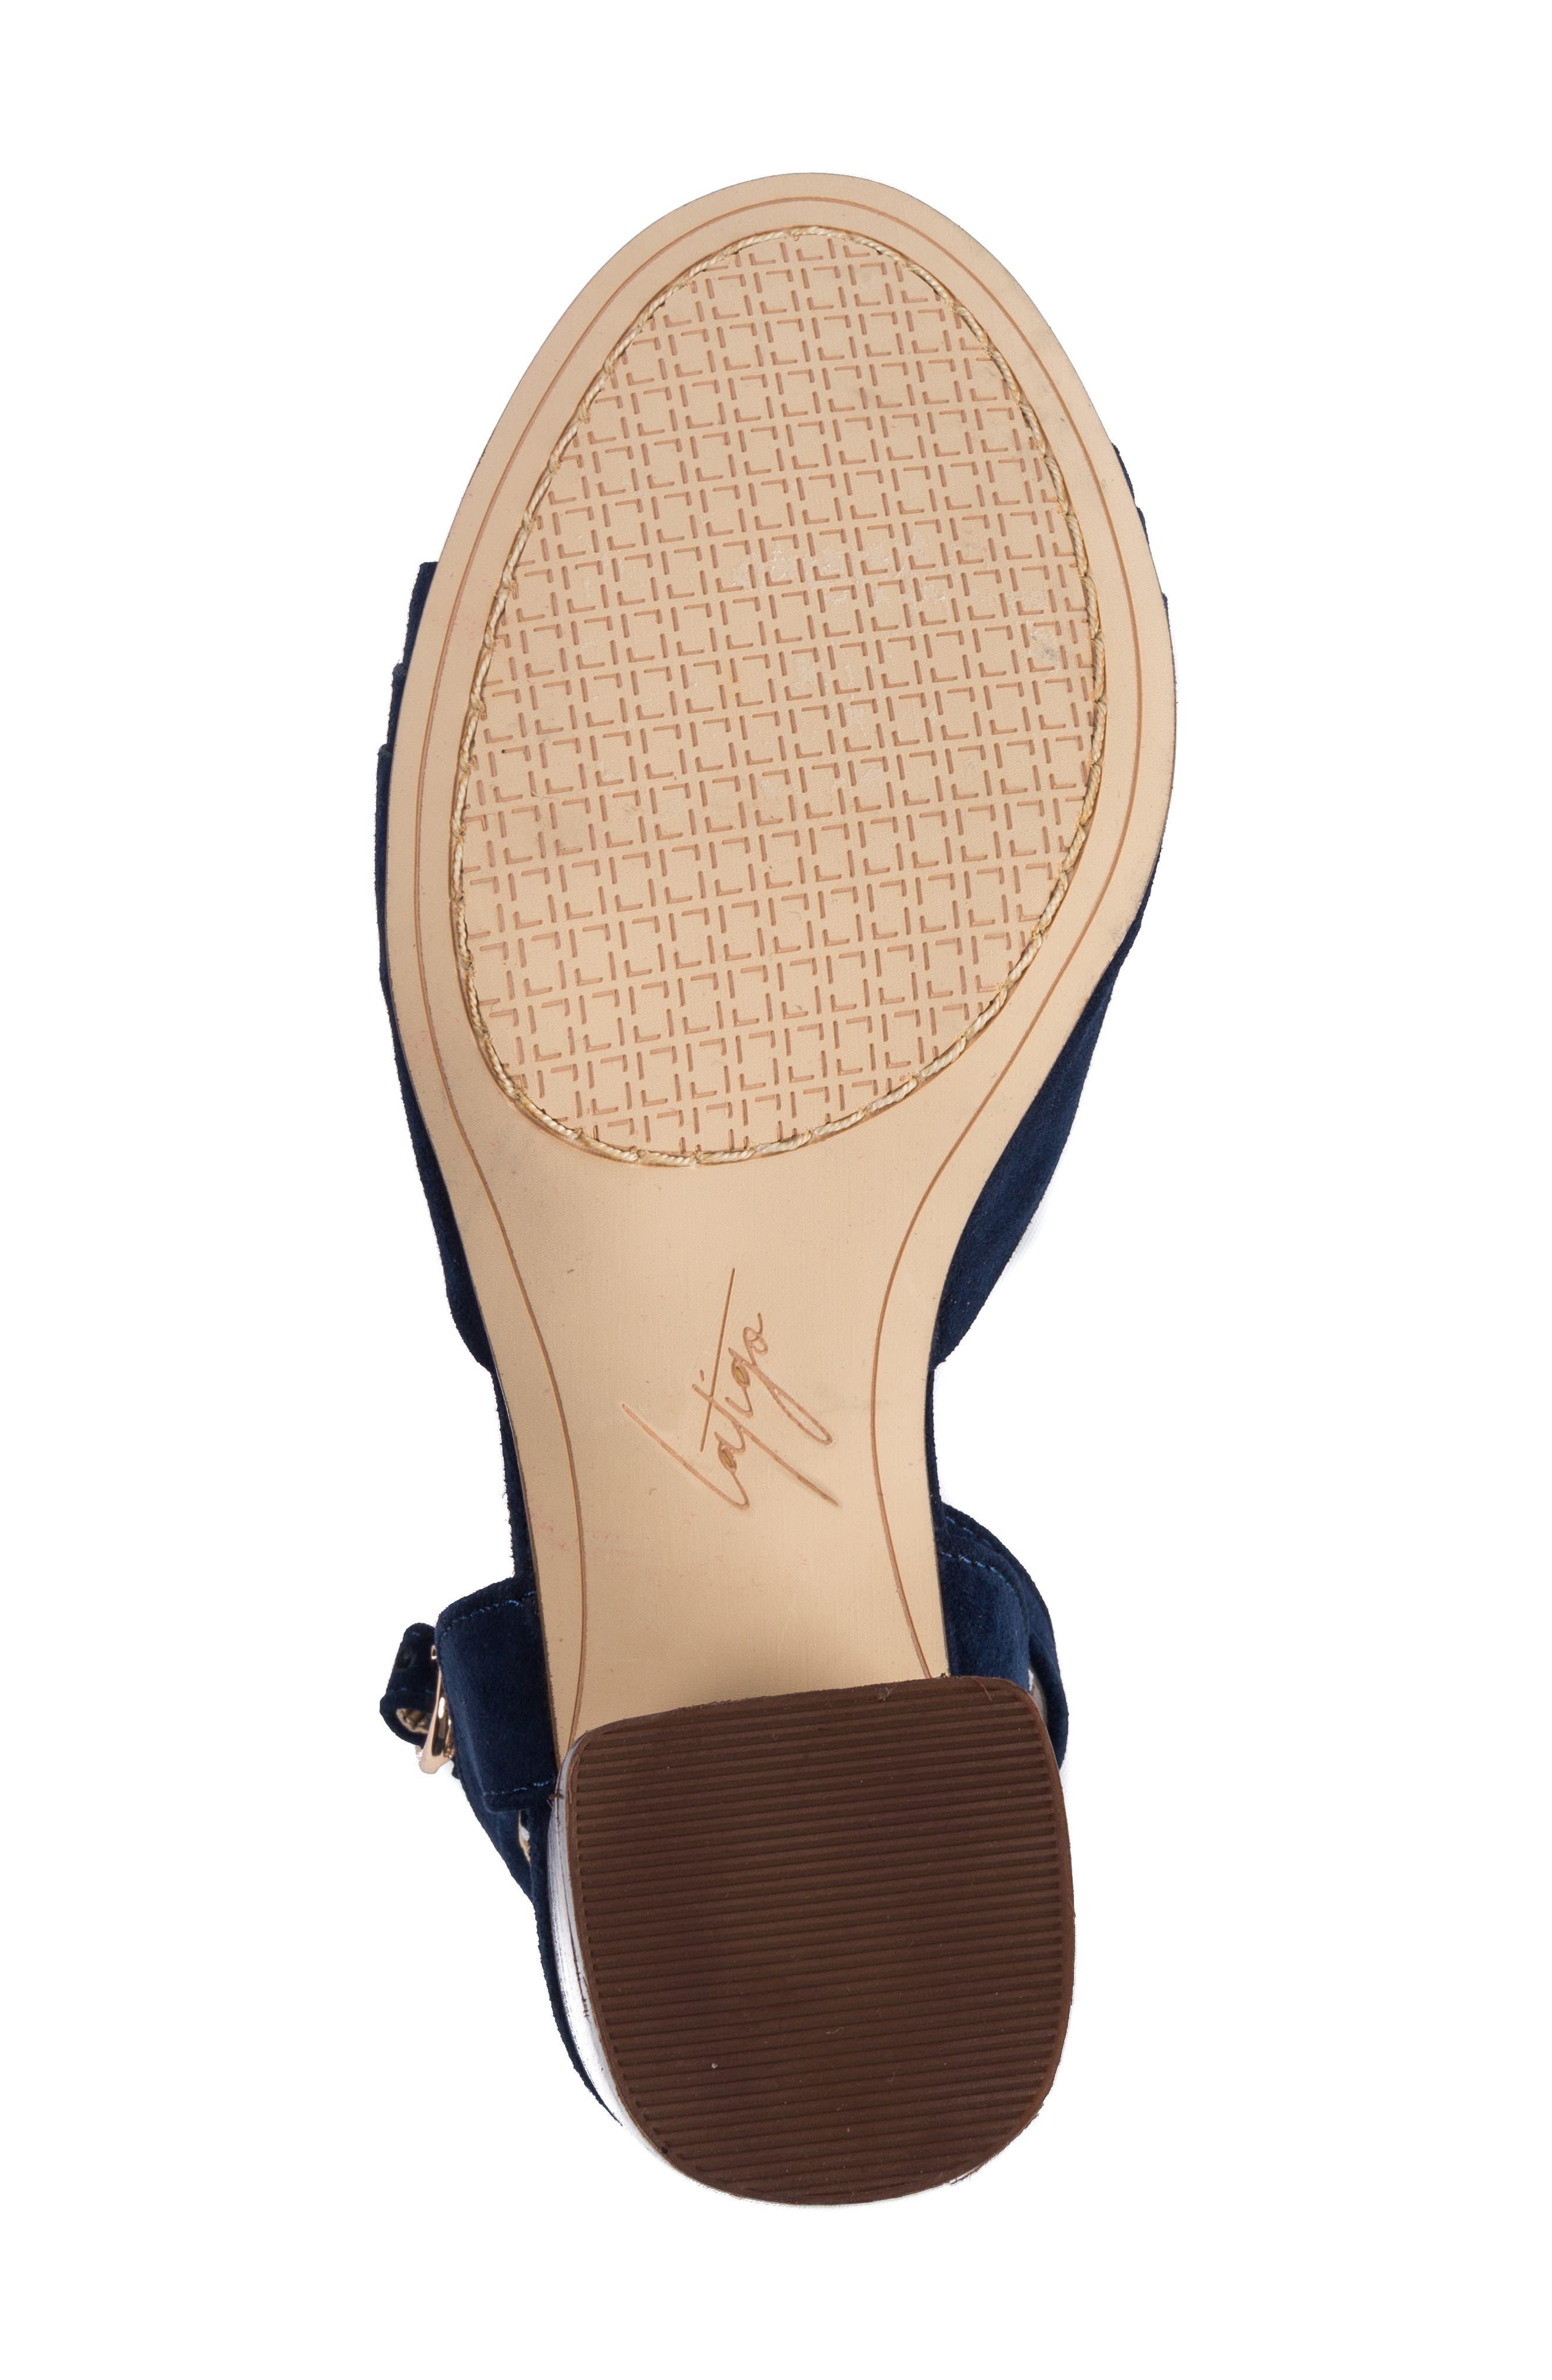 LATIGO, Idelle Ankle Strap Sandal, Alternate thumbnail 6, color, 410